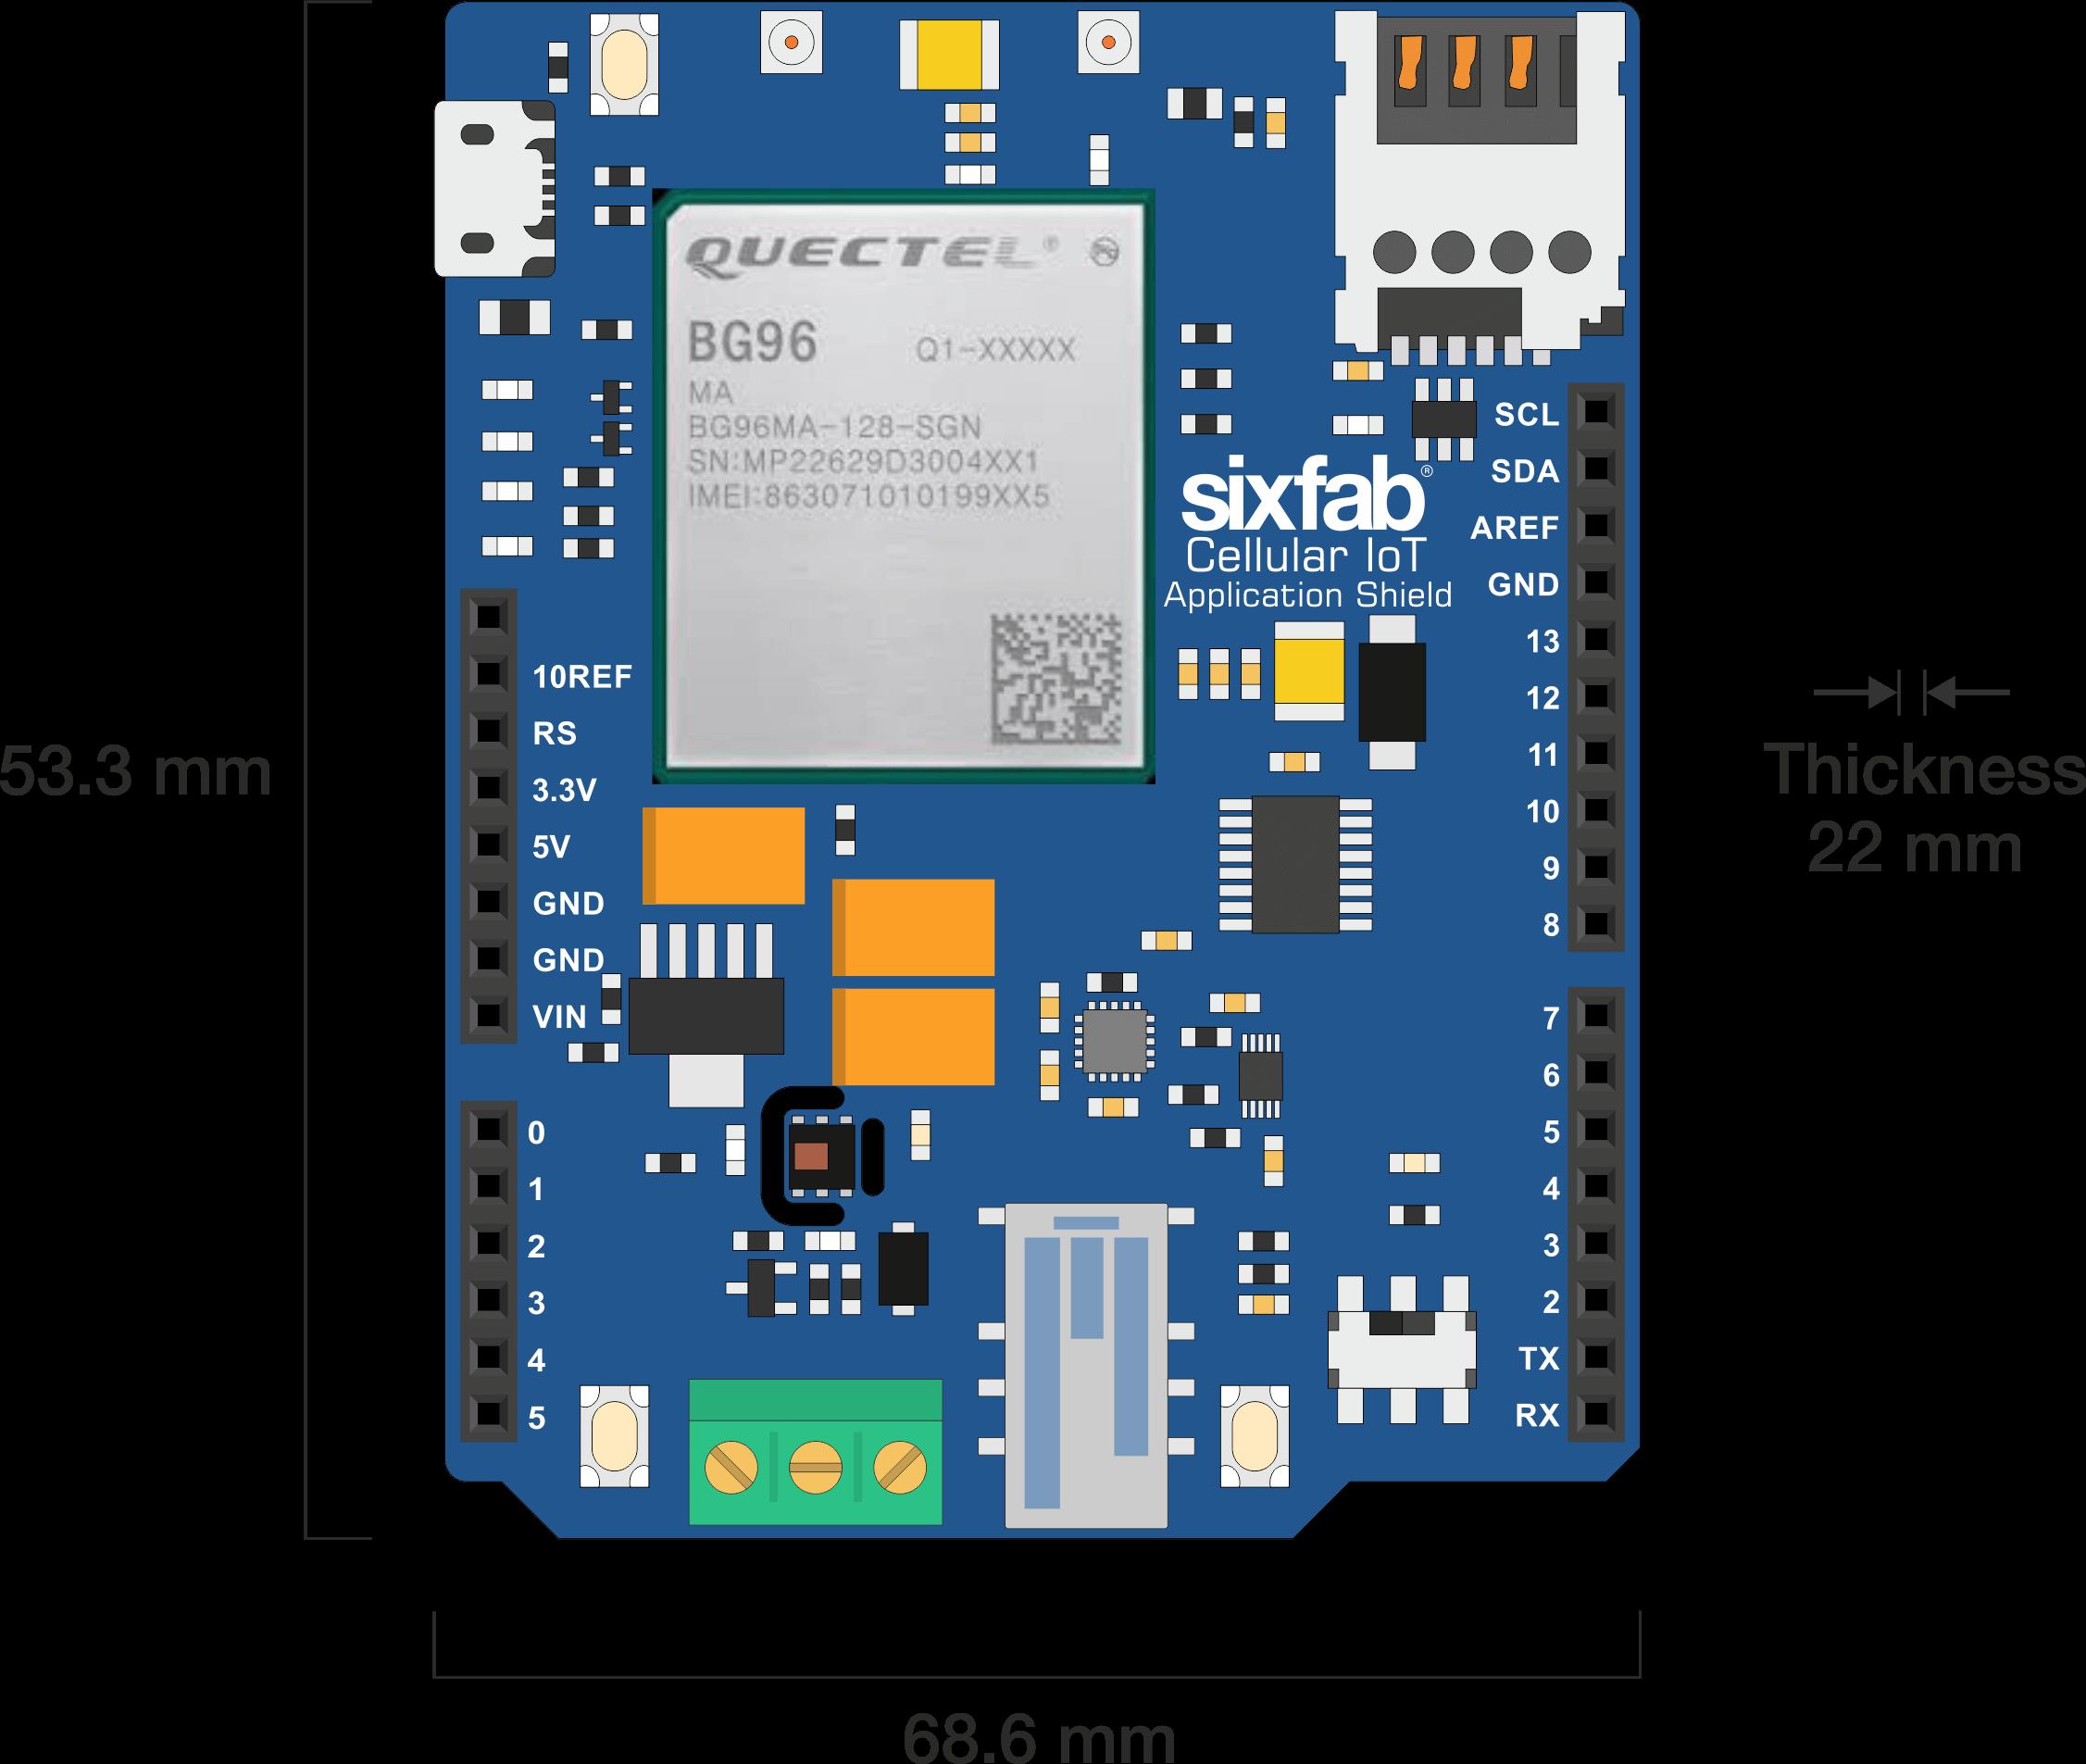 Arduino Cellular IoT Application Shield Dimension